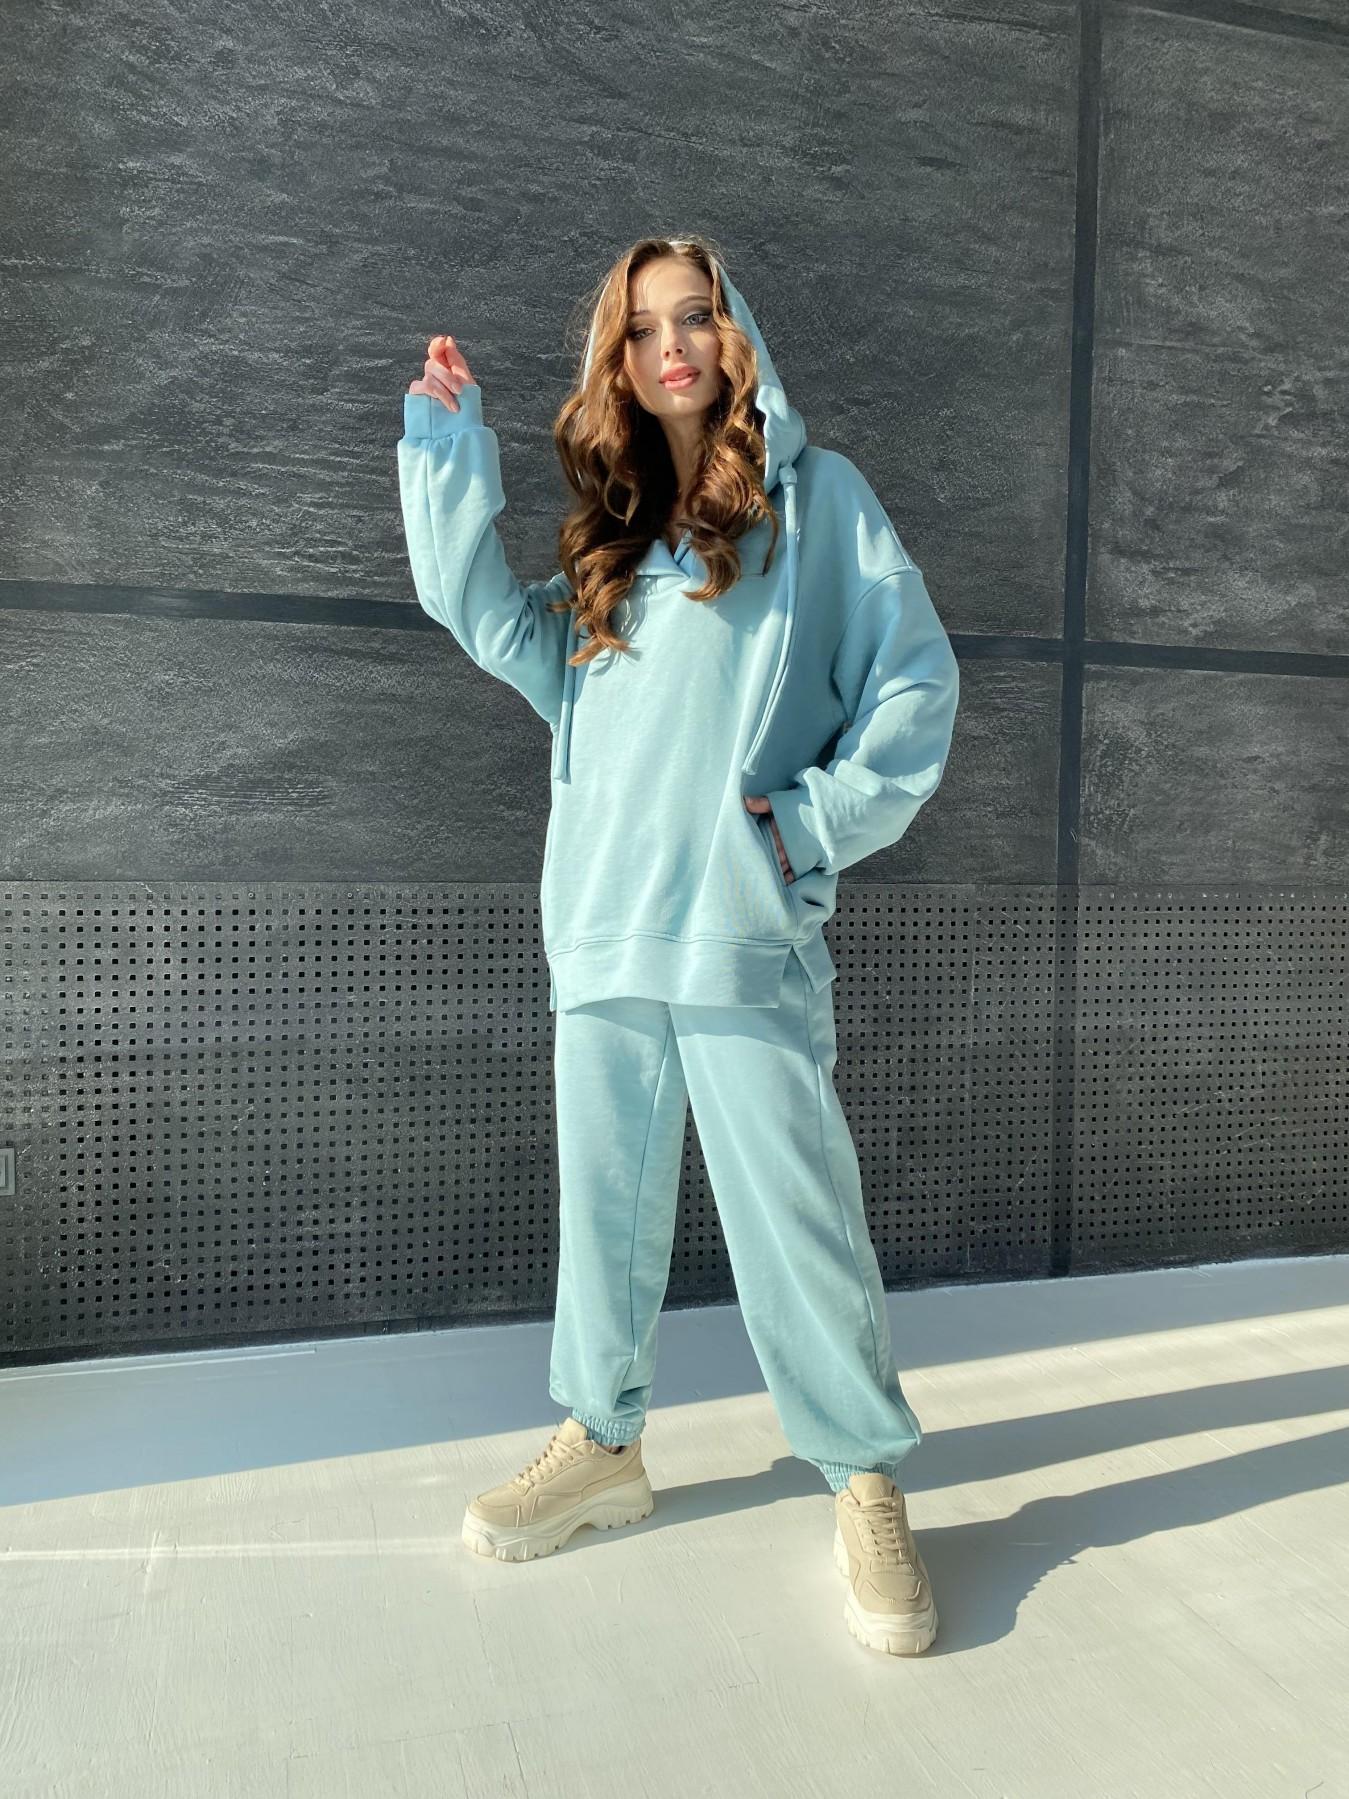 Ярис костюм из 3х нитки 10789 АРТ. 47264 Цвет: Олива - фото 2, интернет магазин tm-modus.ru